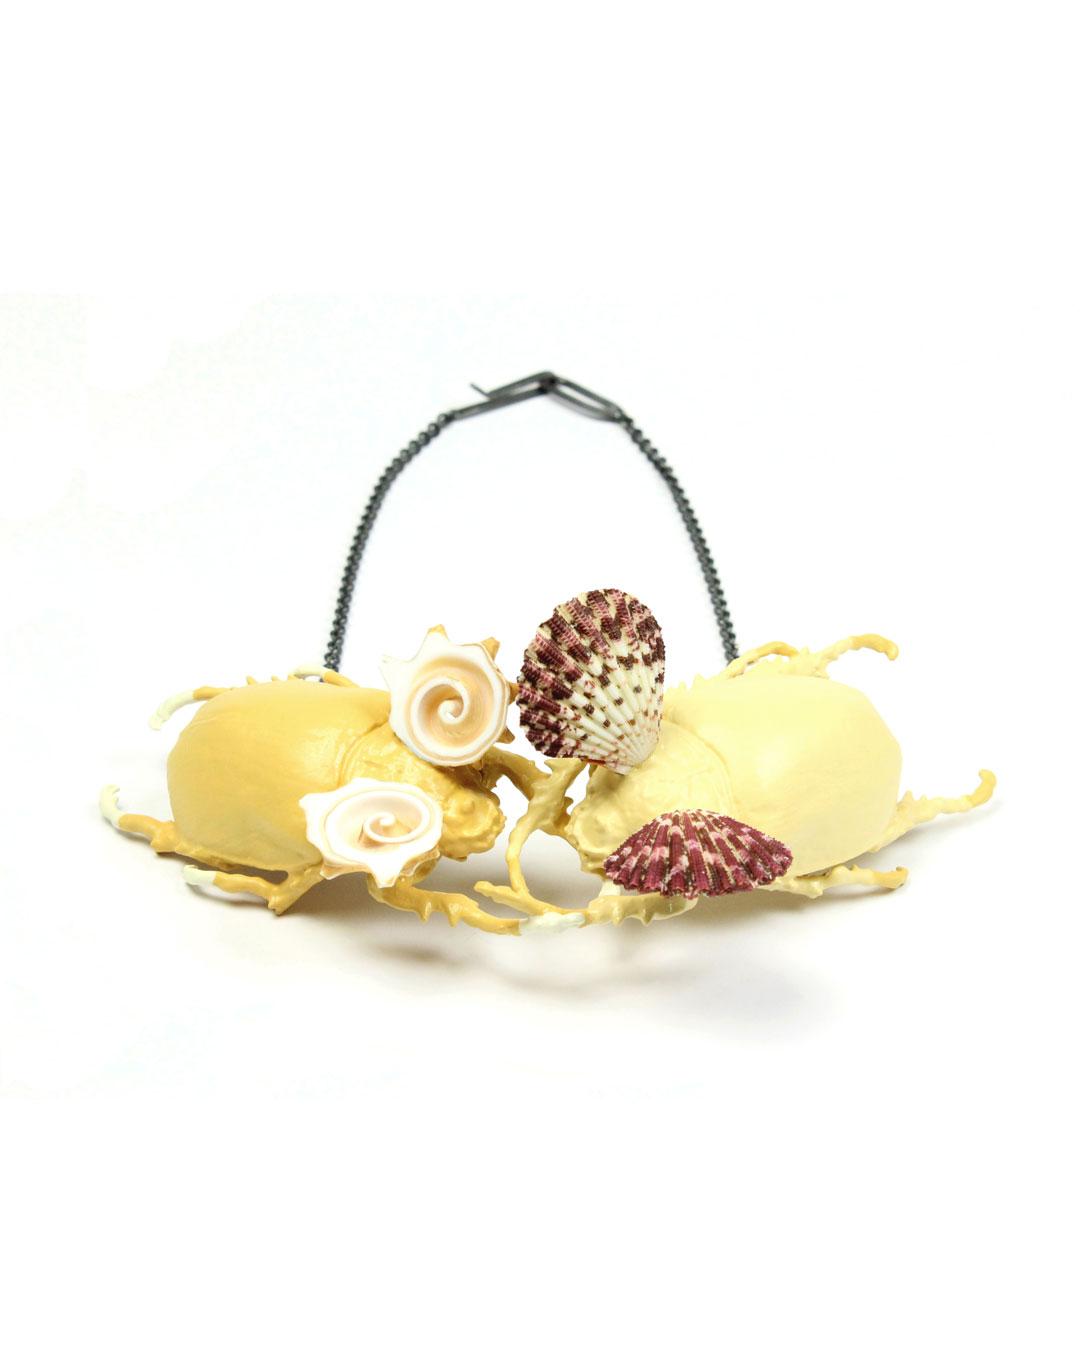 Märta Mattsson, Venus & Botticelli, 2019, necklace; beetles, copper, lacquer, resin, seashells, silver, 90 x 260 x 70 mm, €3150